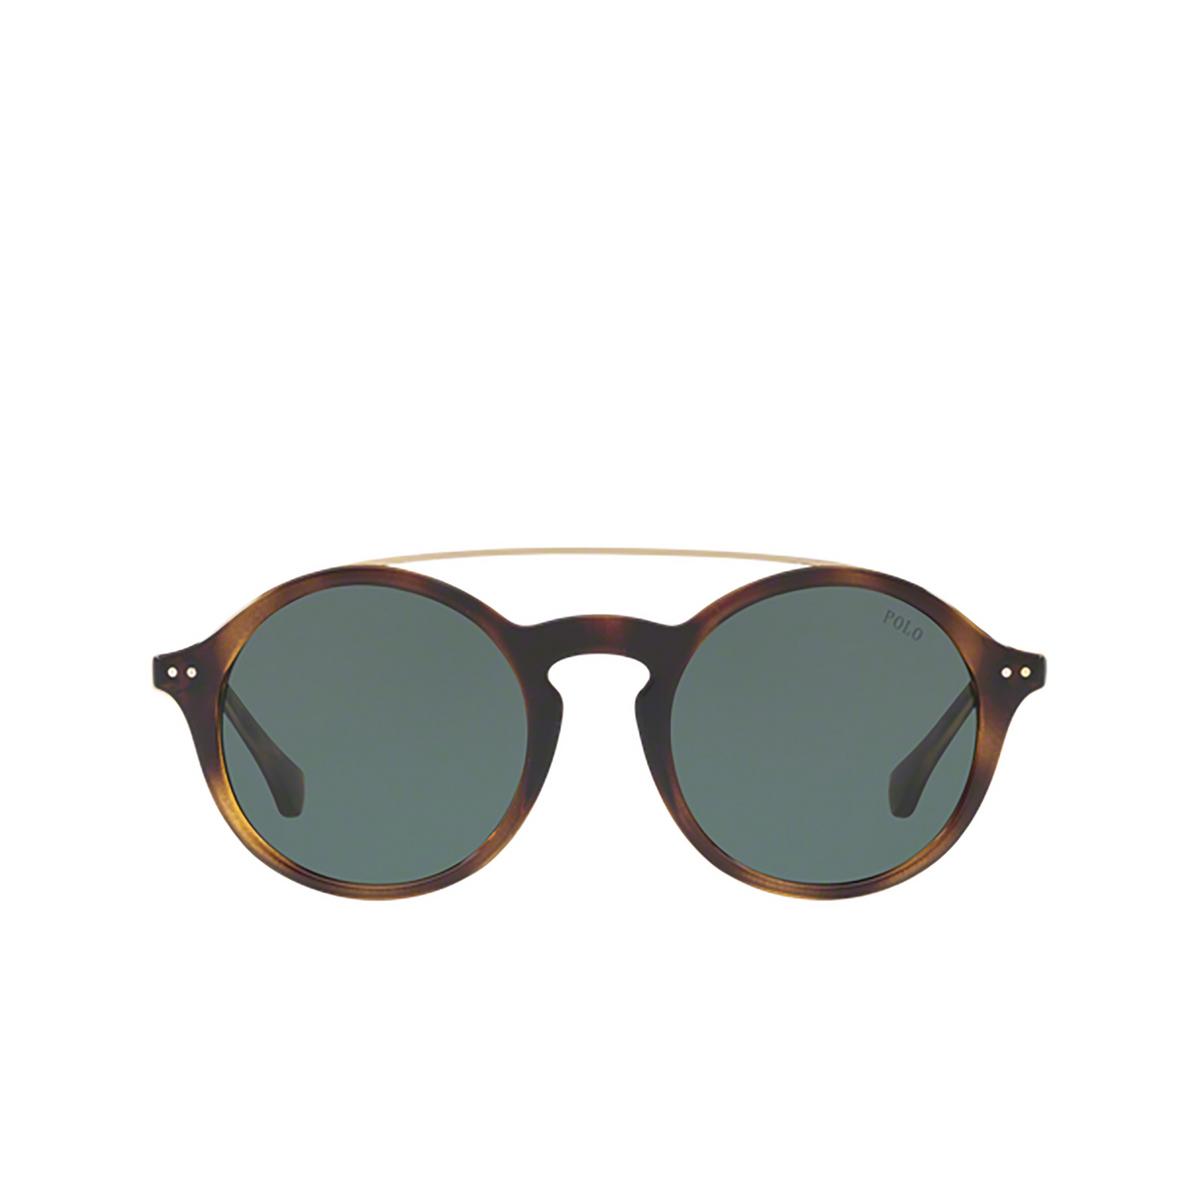 Polo Ralph Lauren® Round Sunglasses: PH4122 color 500371.